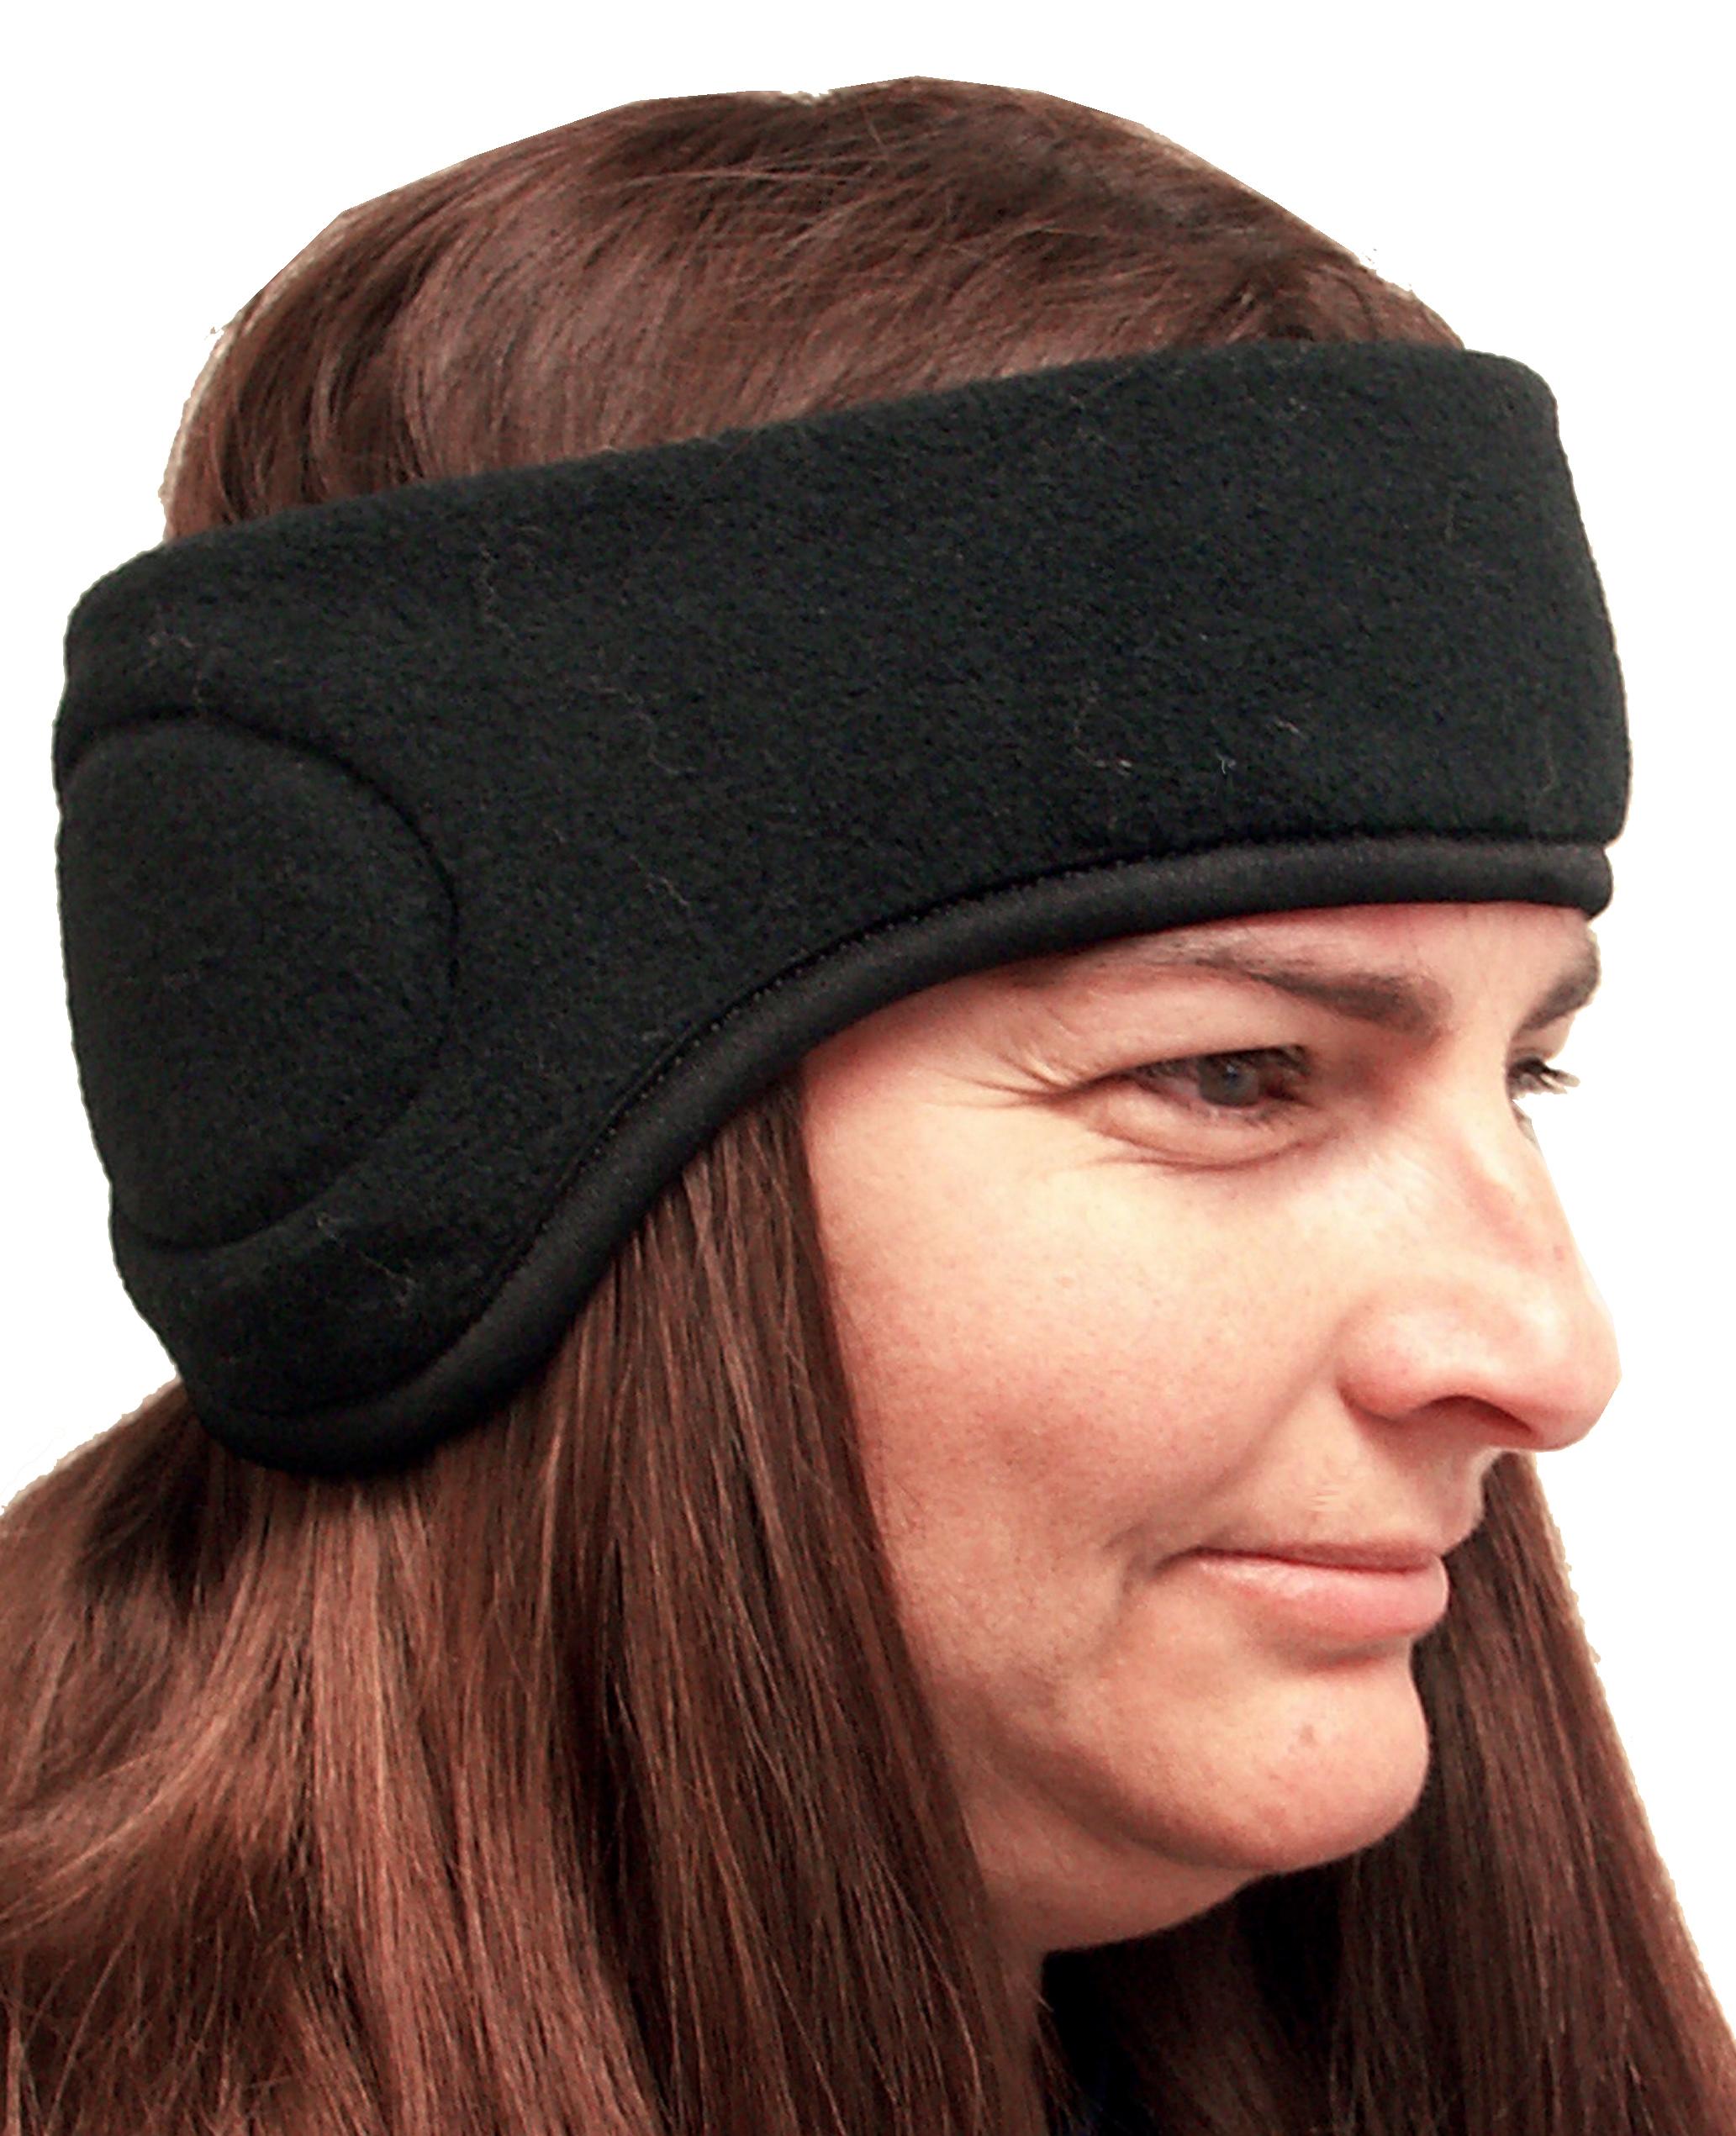 Toasty Headband Earmuff